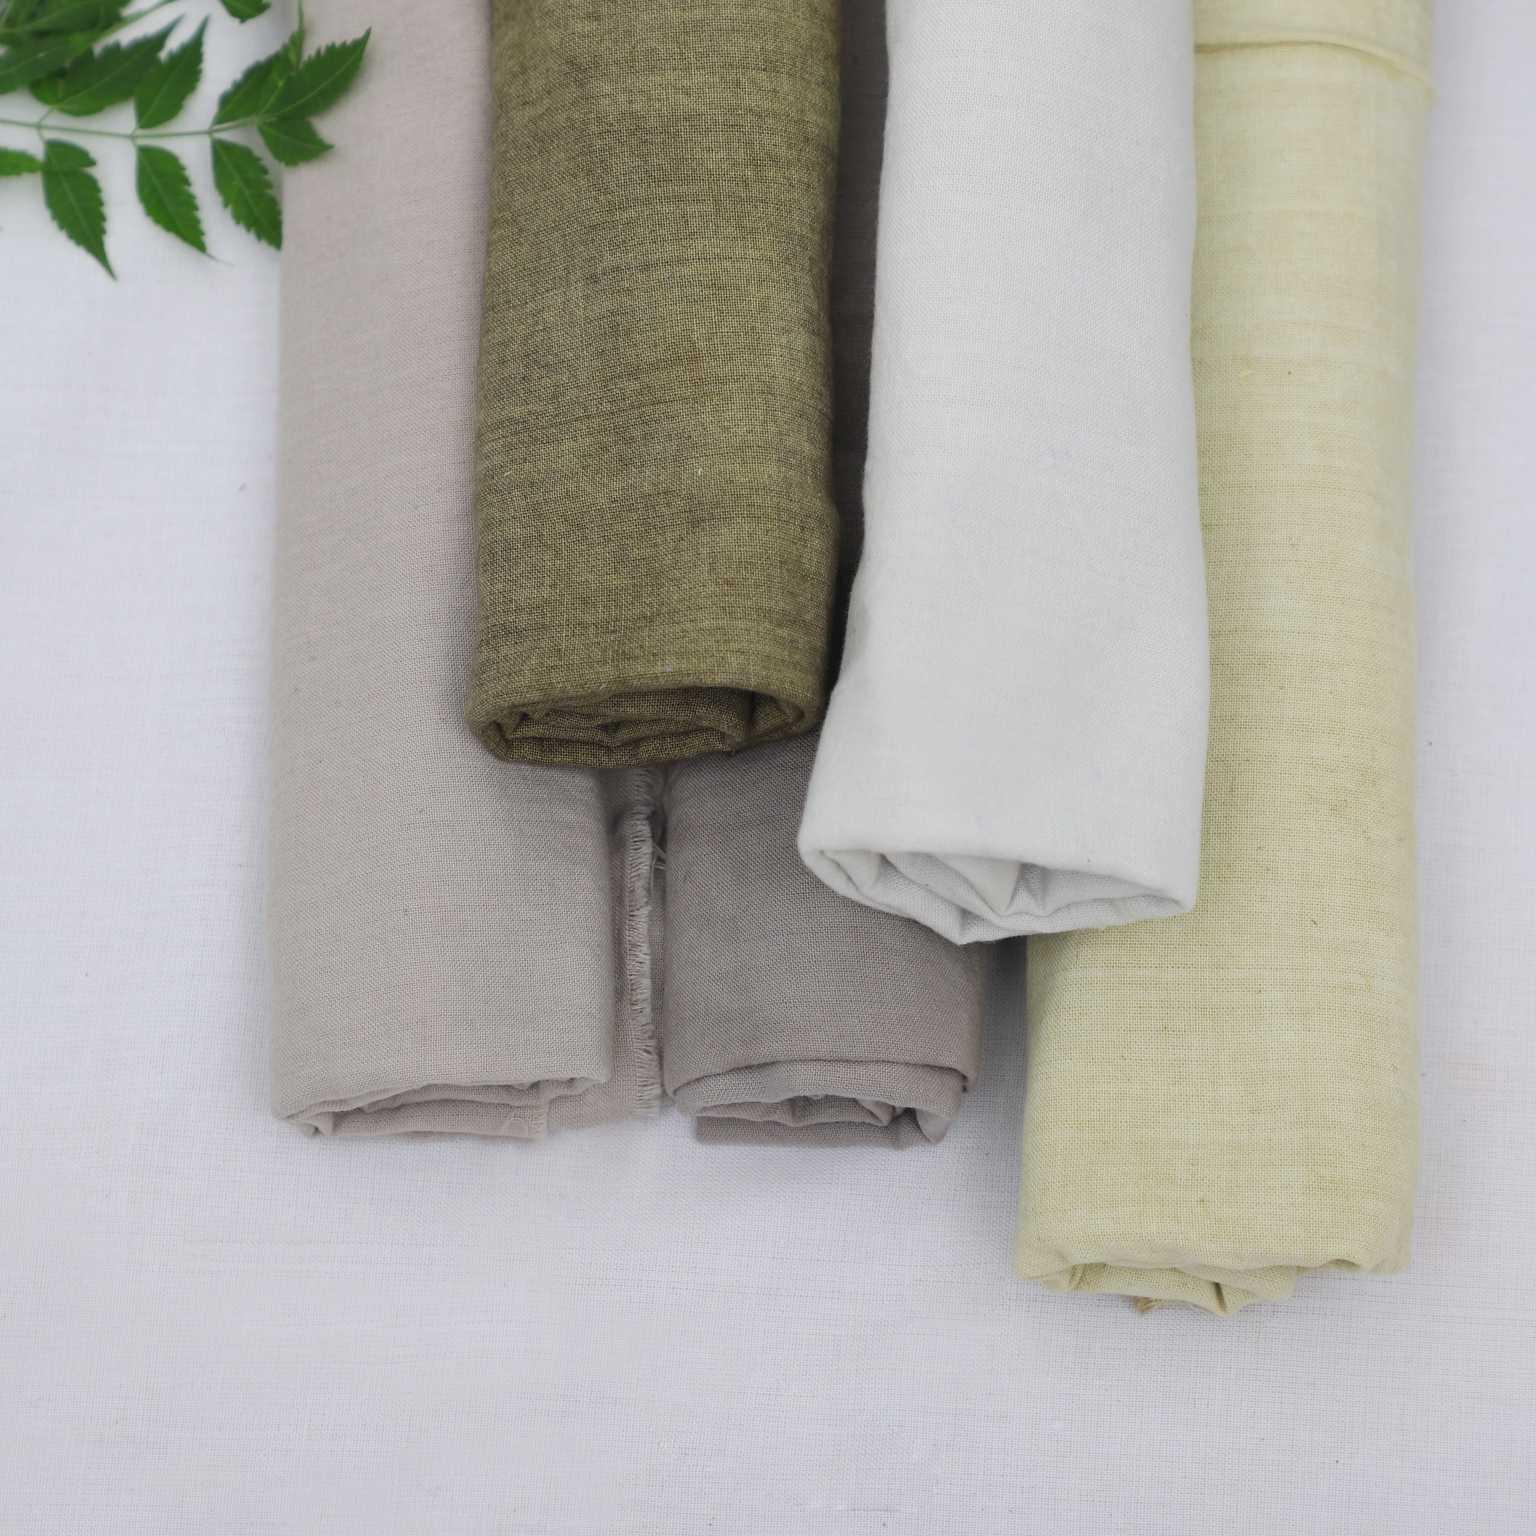 Handloom Khadi Fabric pic 2